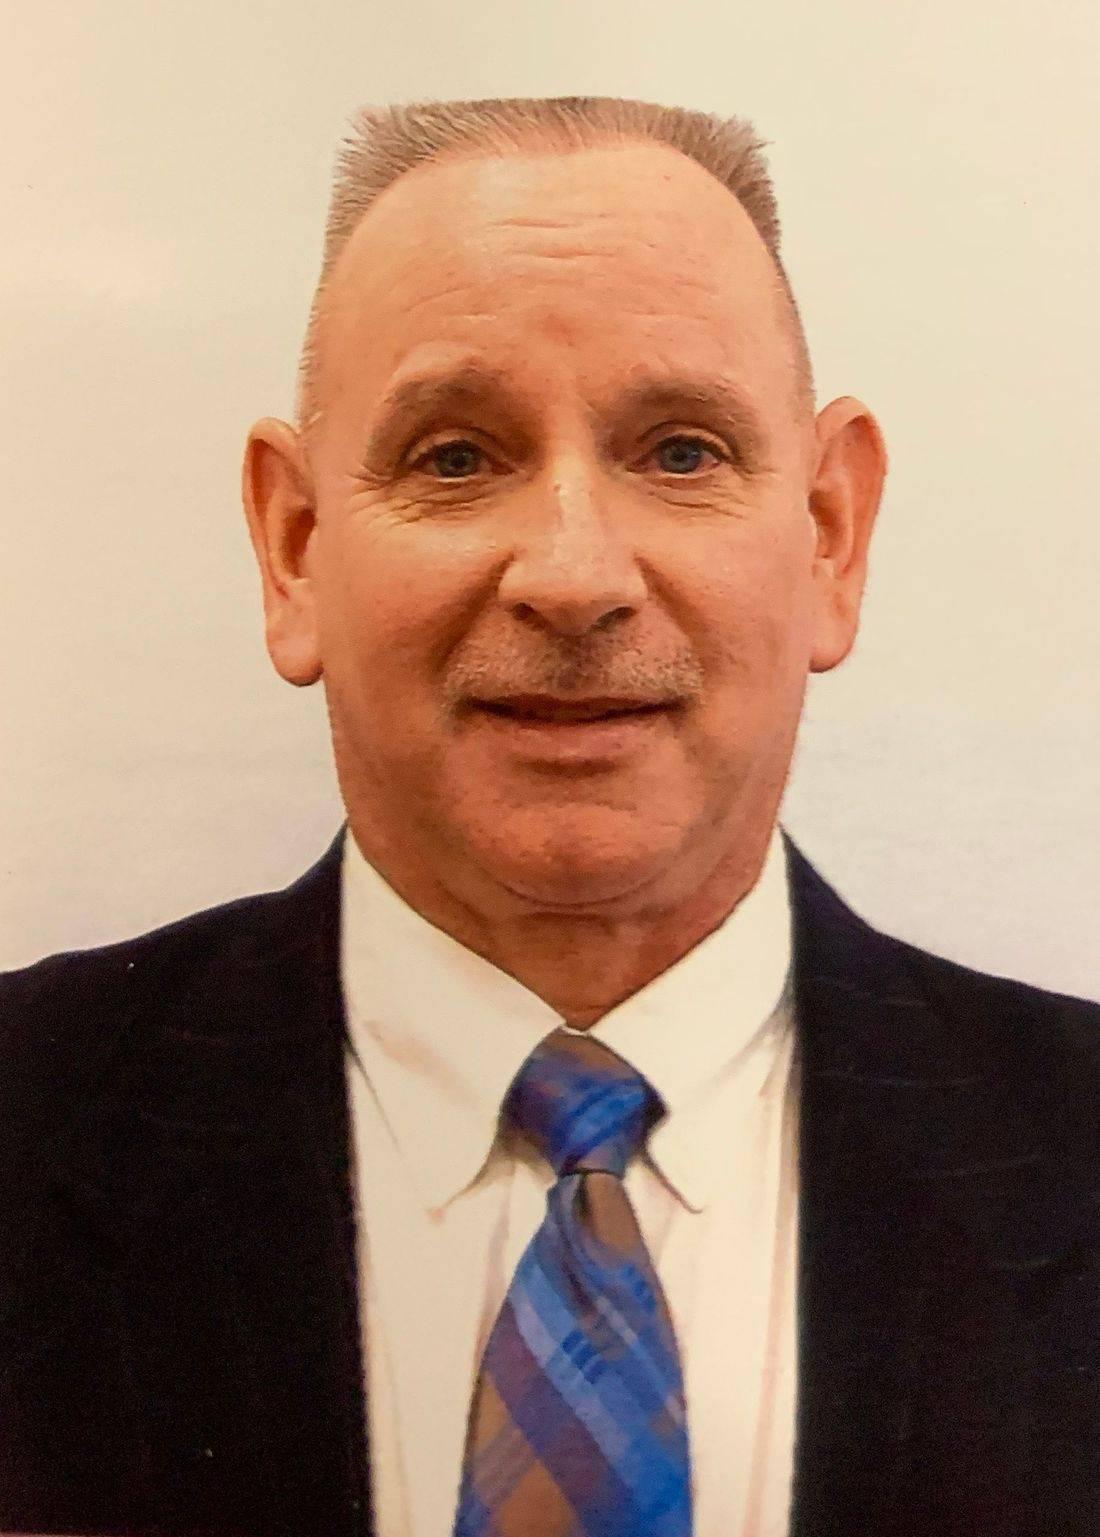 Paul Manney Medicare Agent Dayton Ohio